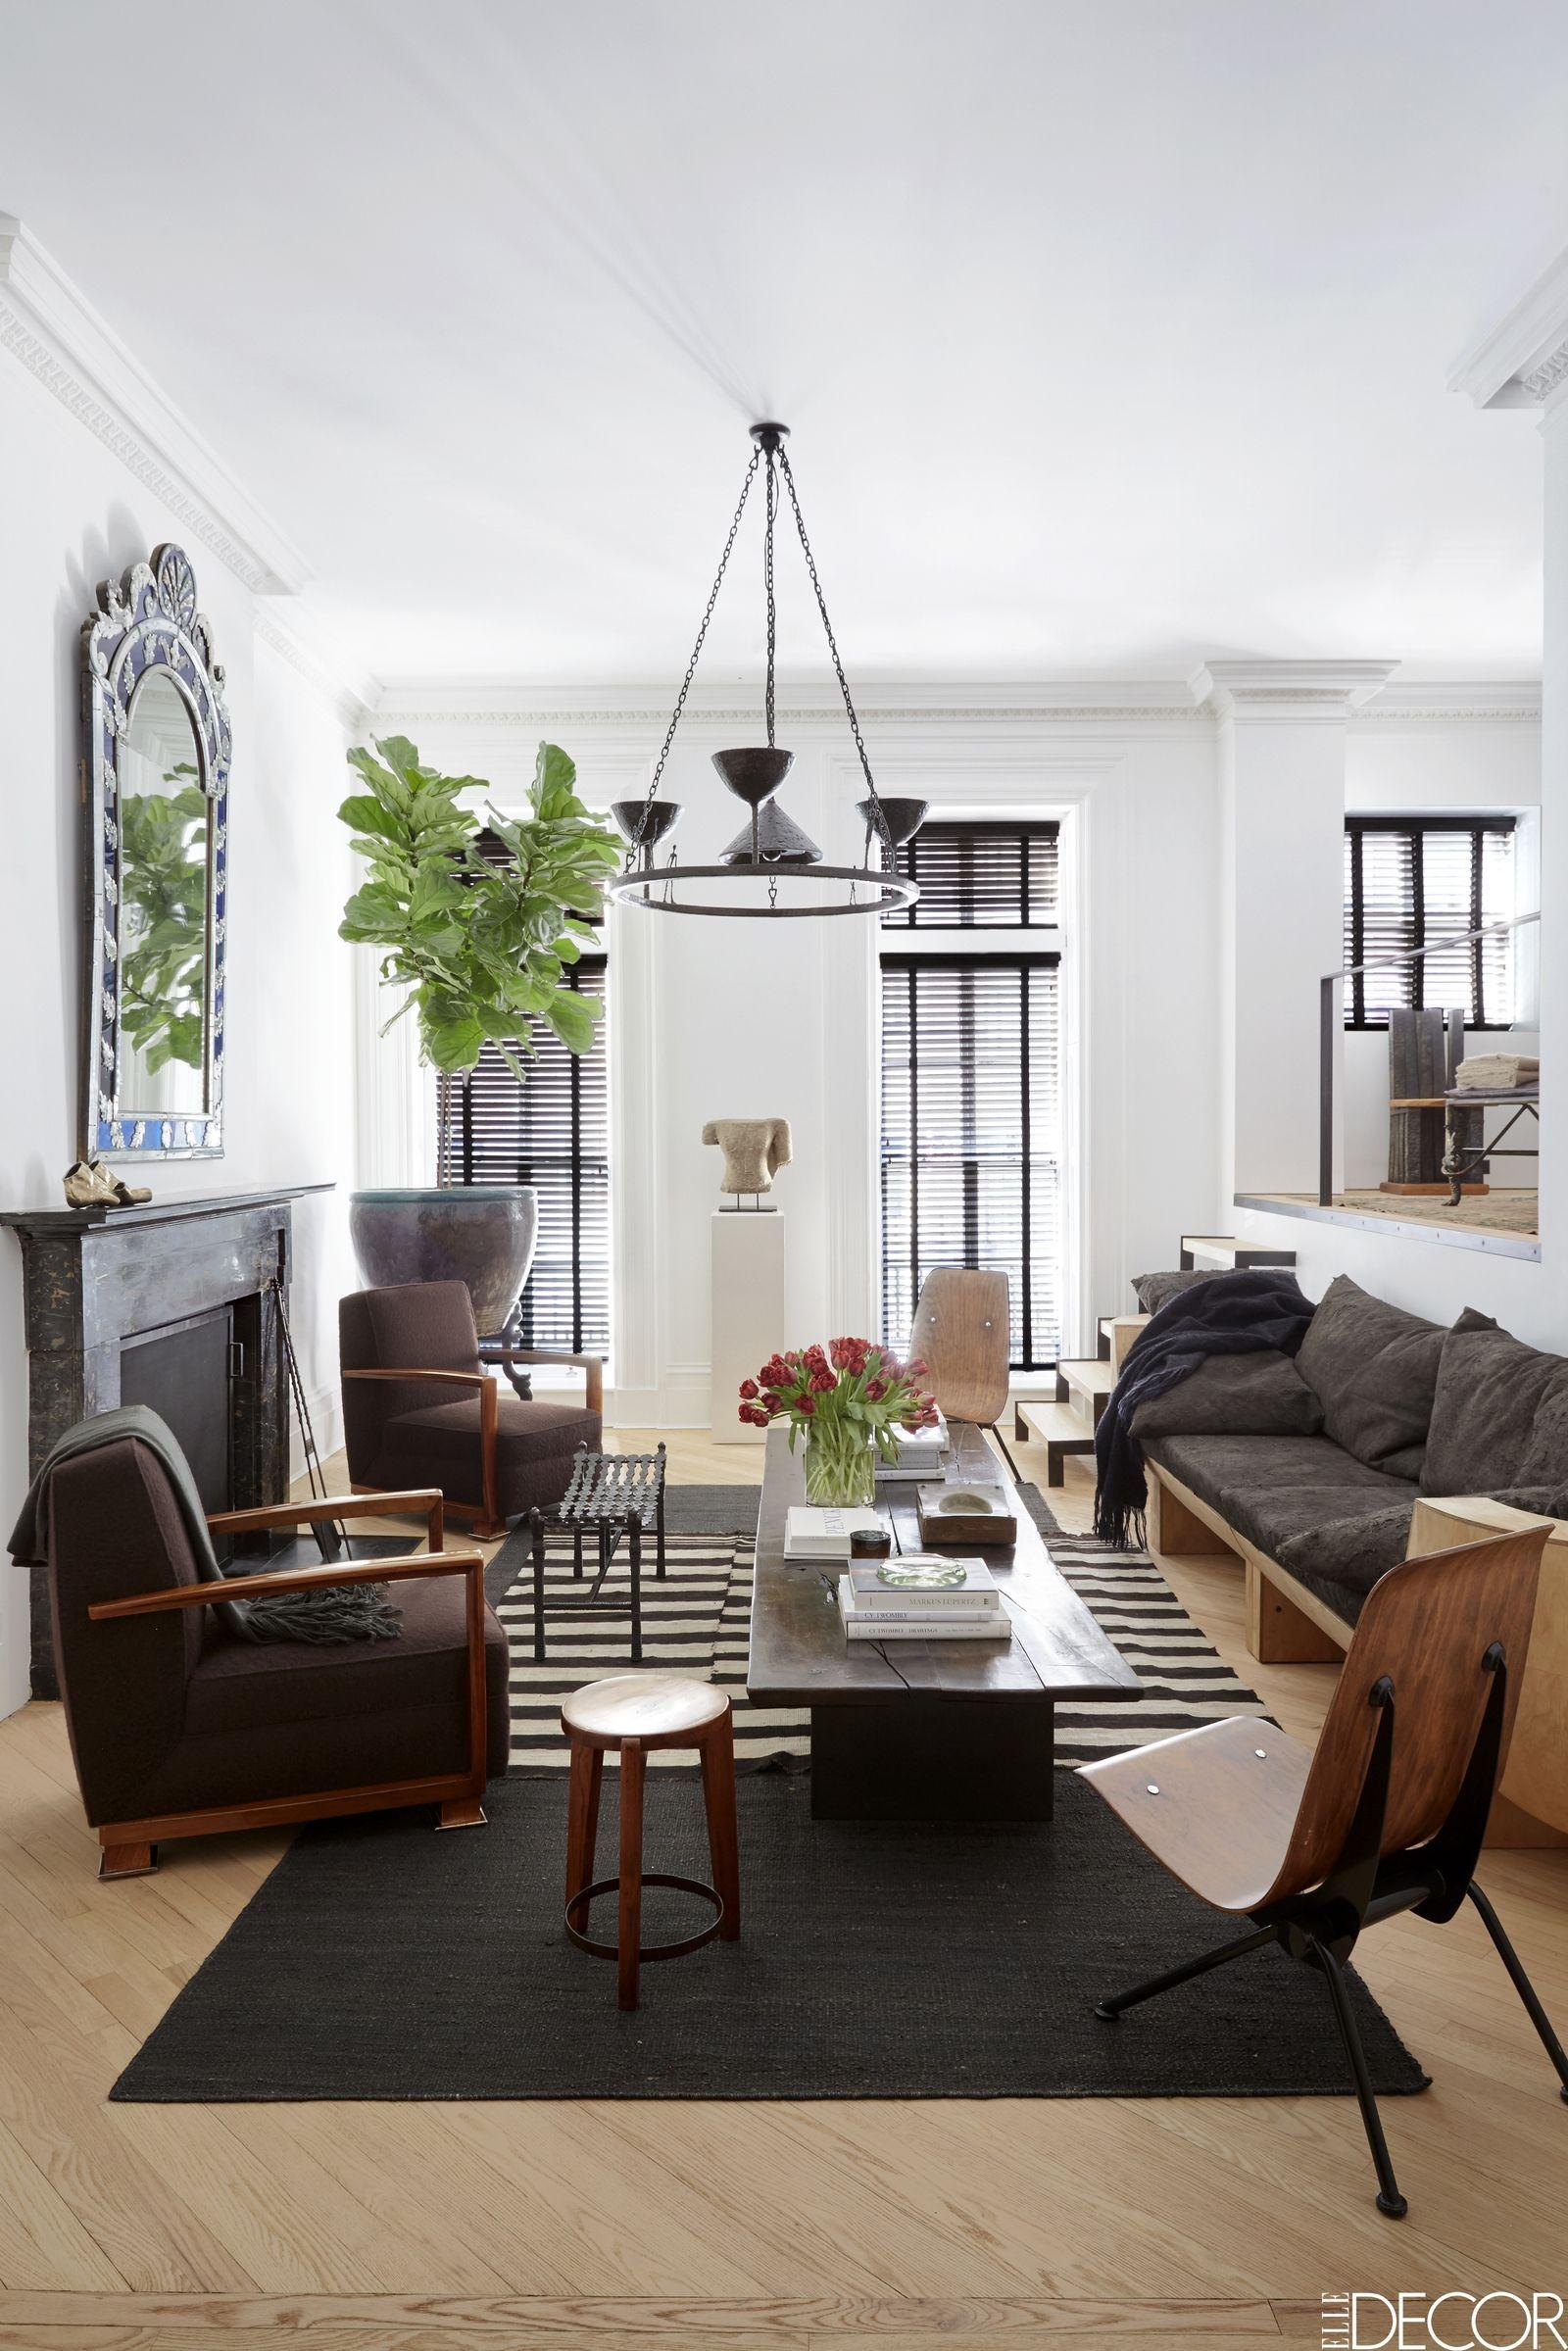 HOUSE TOUR: A New York City Apartment With Laid-Back LA Vibes   City ...